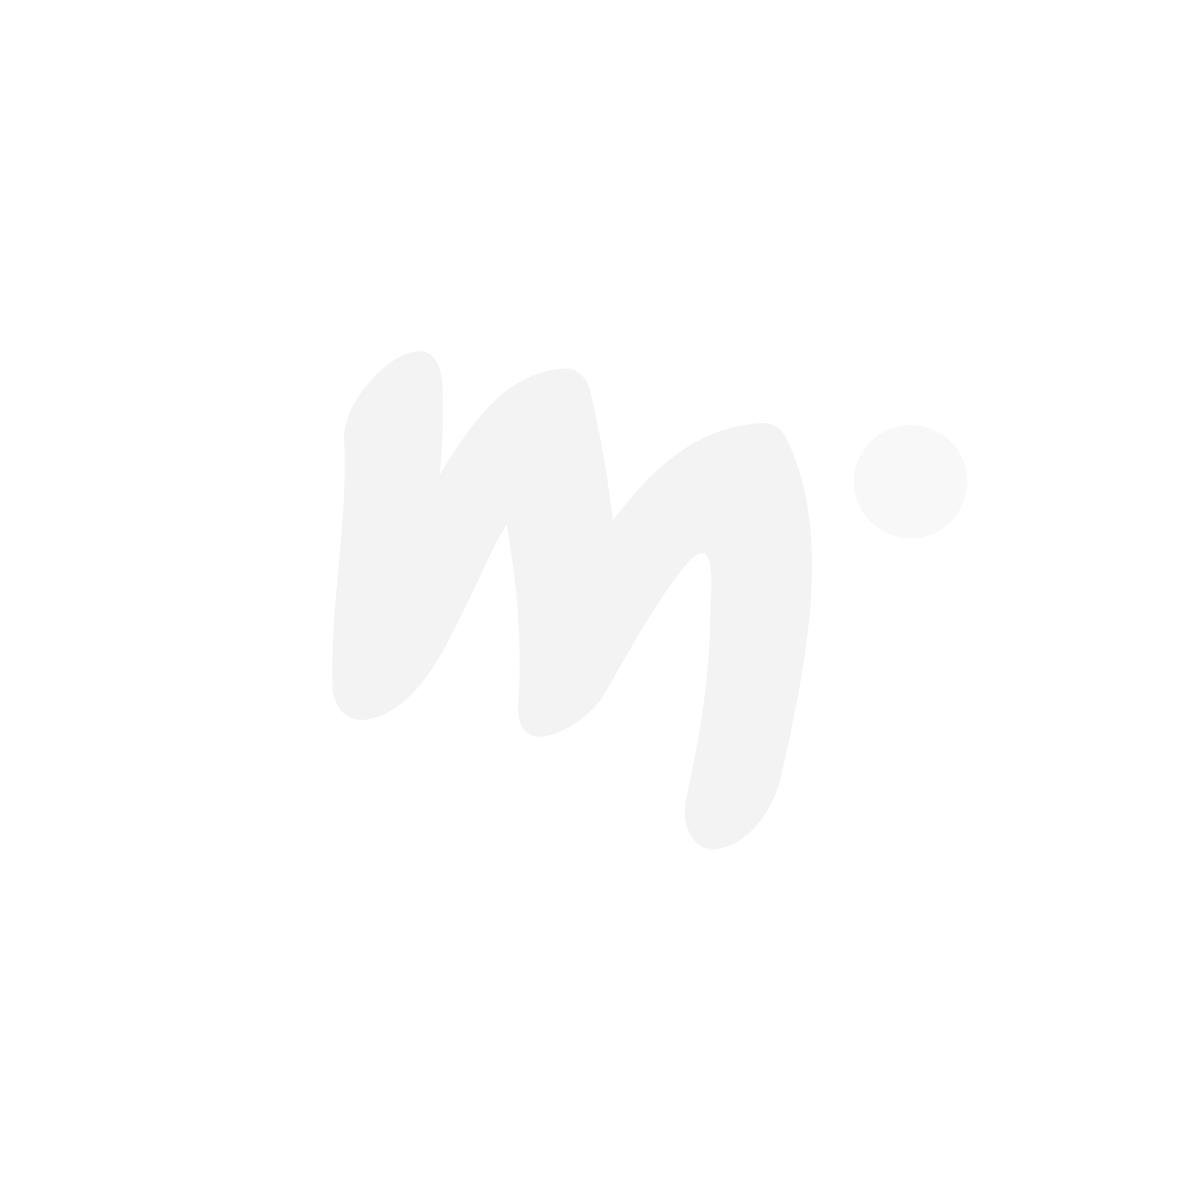 Mauri Kunnas Hassula-tunika turkoosi